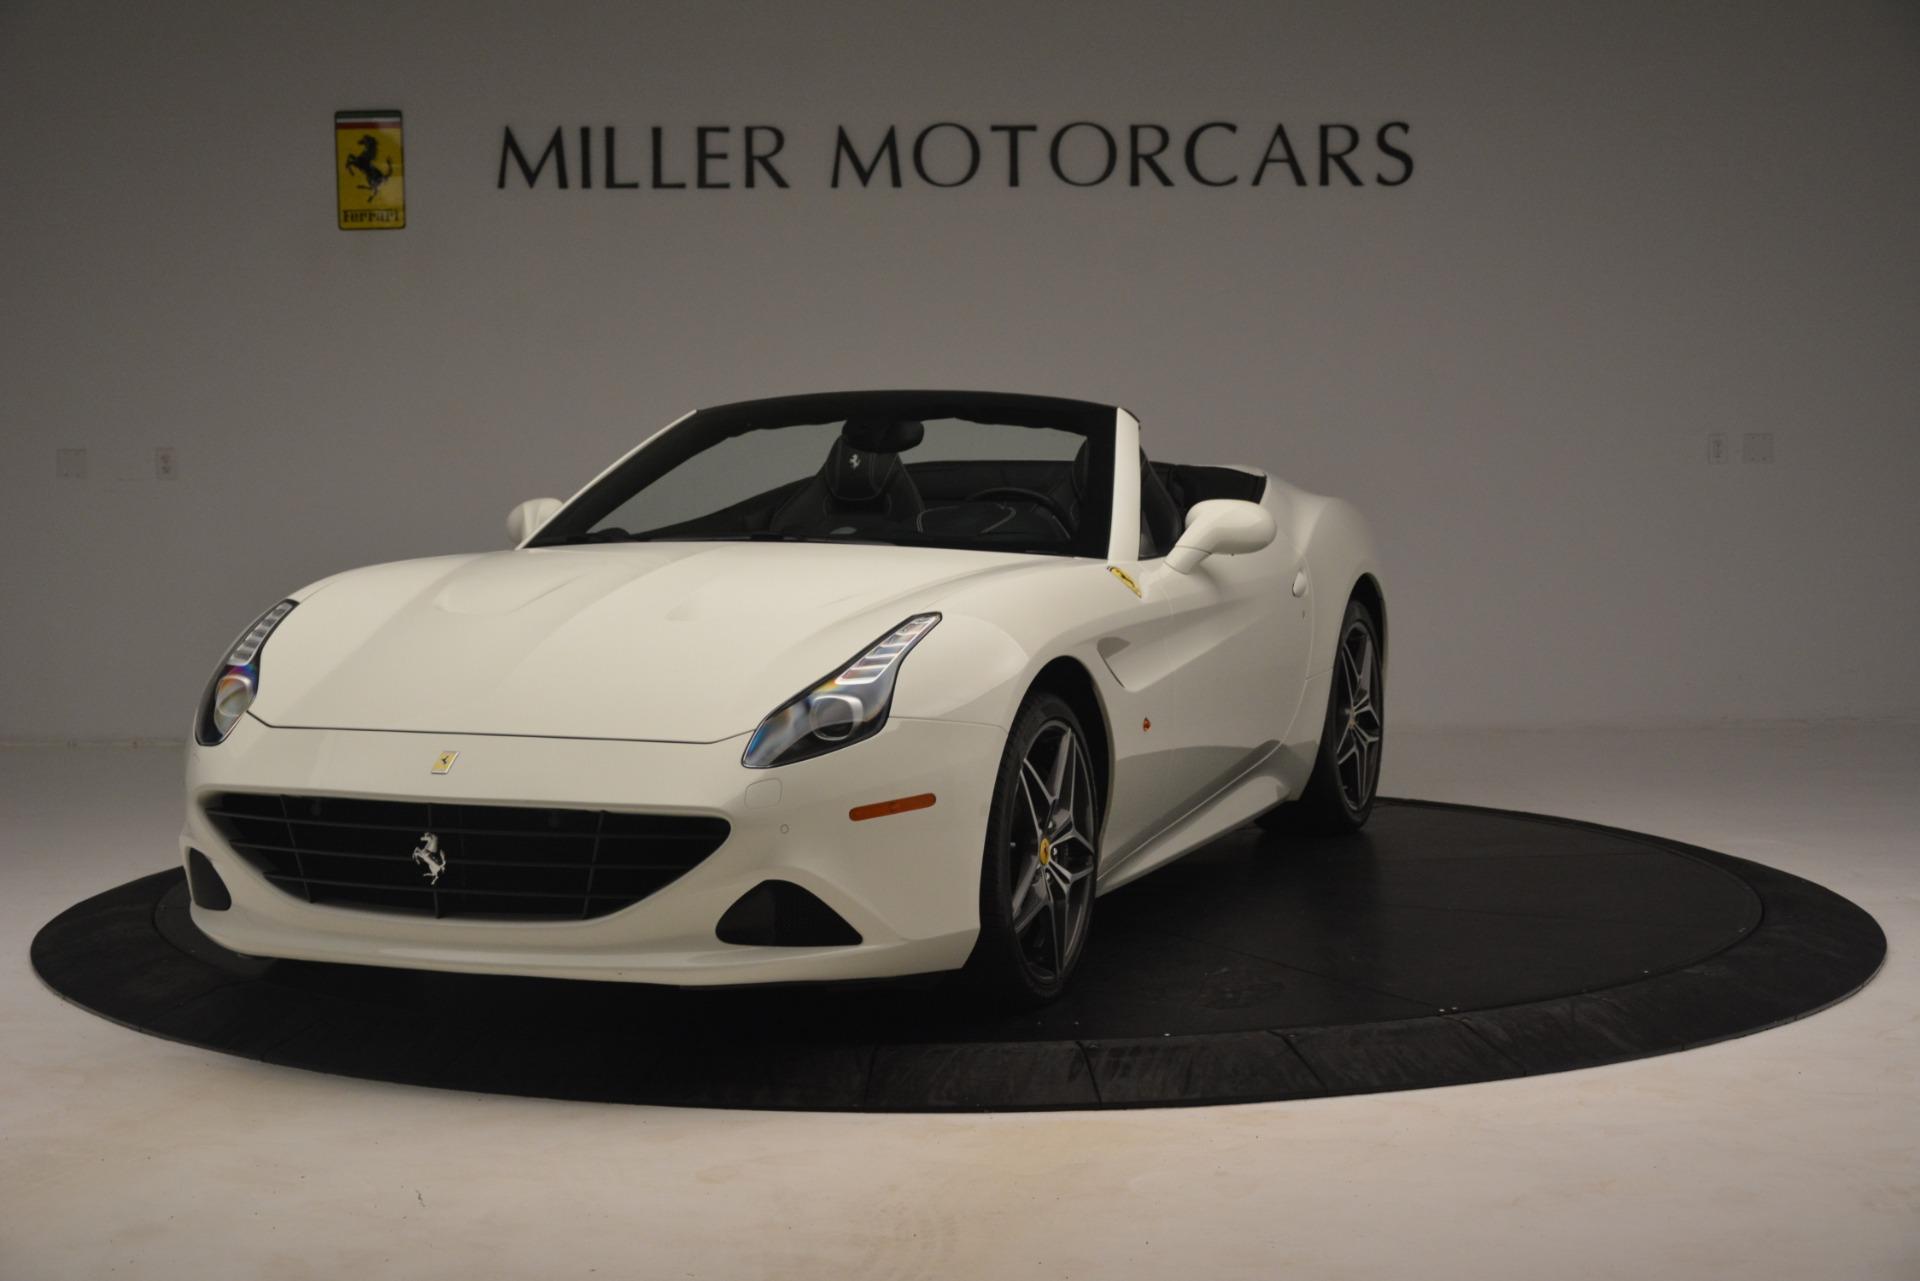 Used 2016 Ferrari California T for sale $141,900 at Aston Martin of Greenwich in Greenwich CT 06830 1